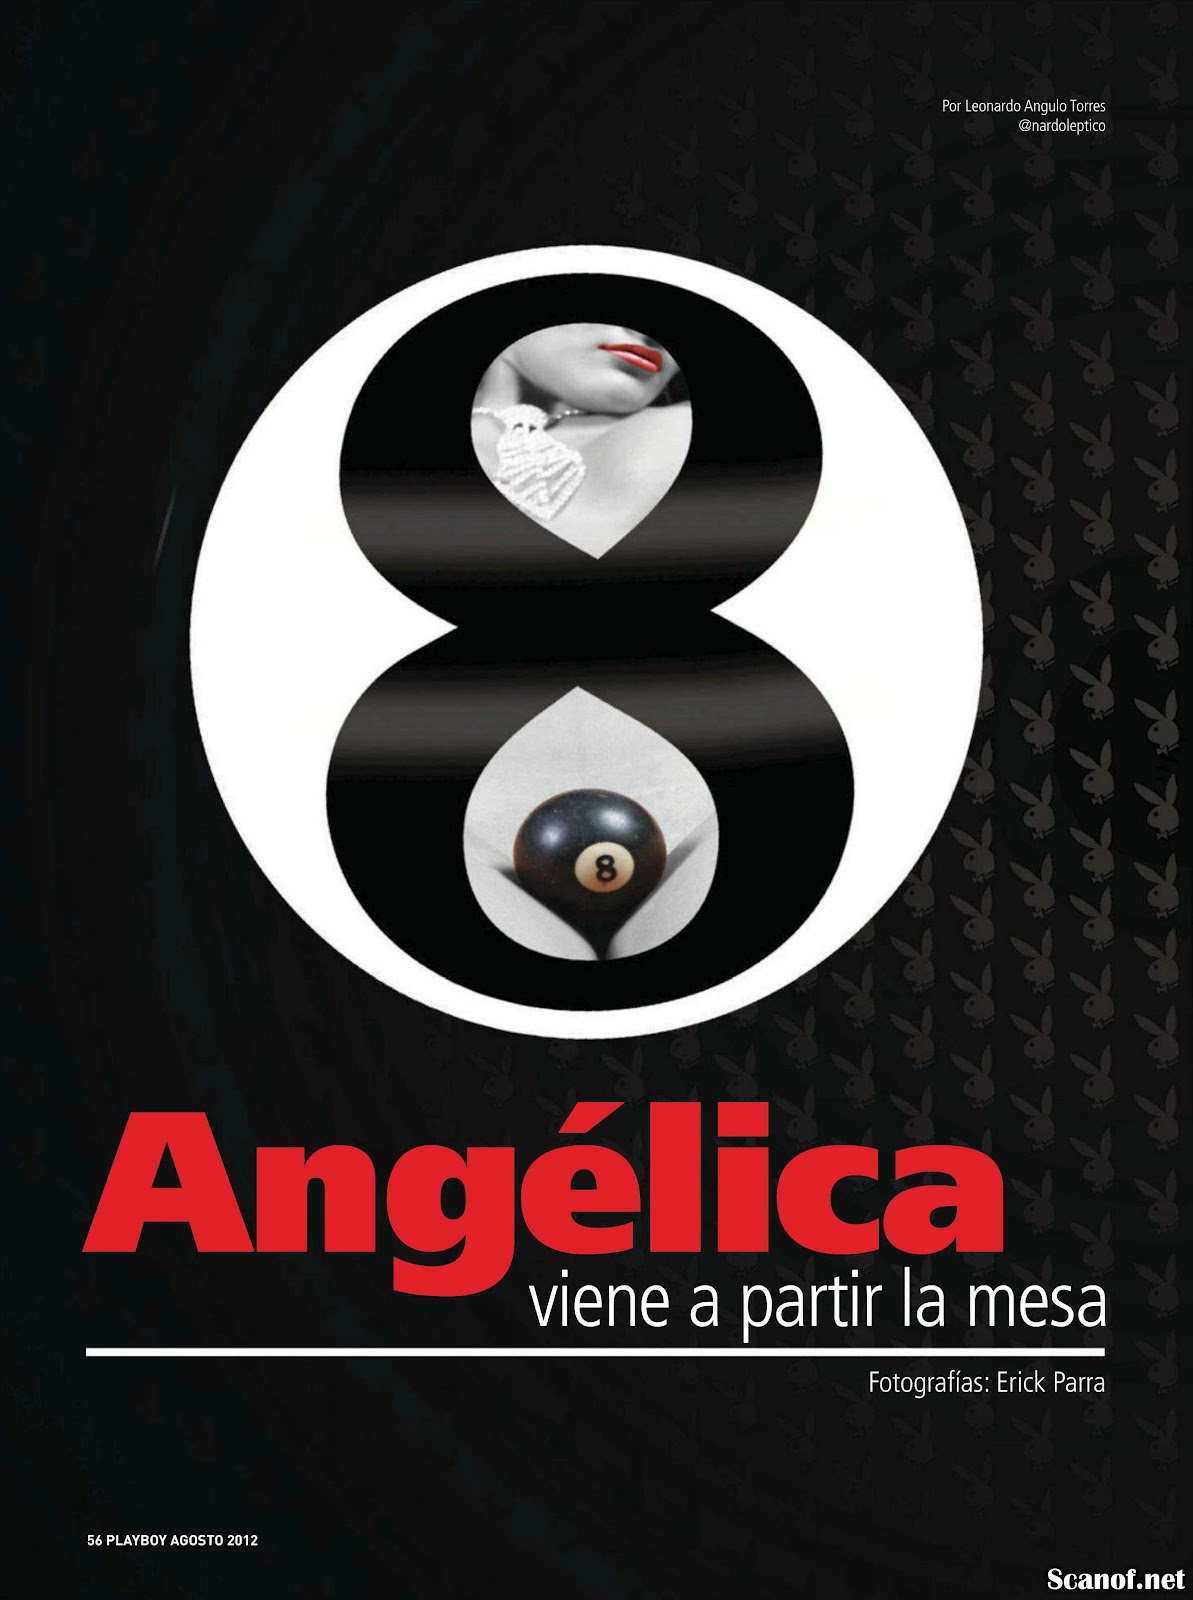 http://1.bp.blogspot.com/-evVrv9YpH7c/UCG9fTKv3eI/AAAAAAAARjQ/9S_eDzYOr7g/s1600/Playboy_Venezuela_2012_08_Scanof.net_056.jpg